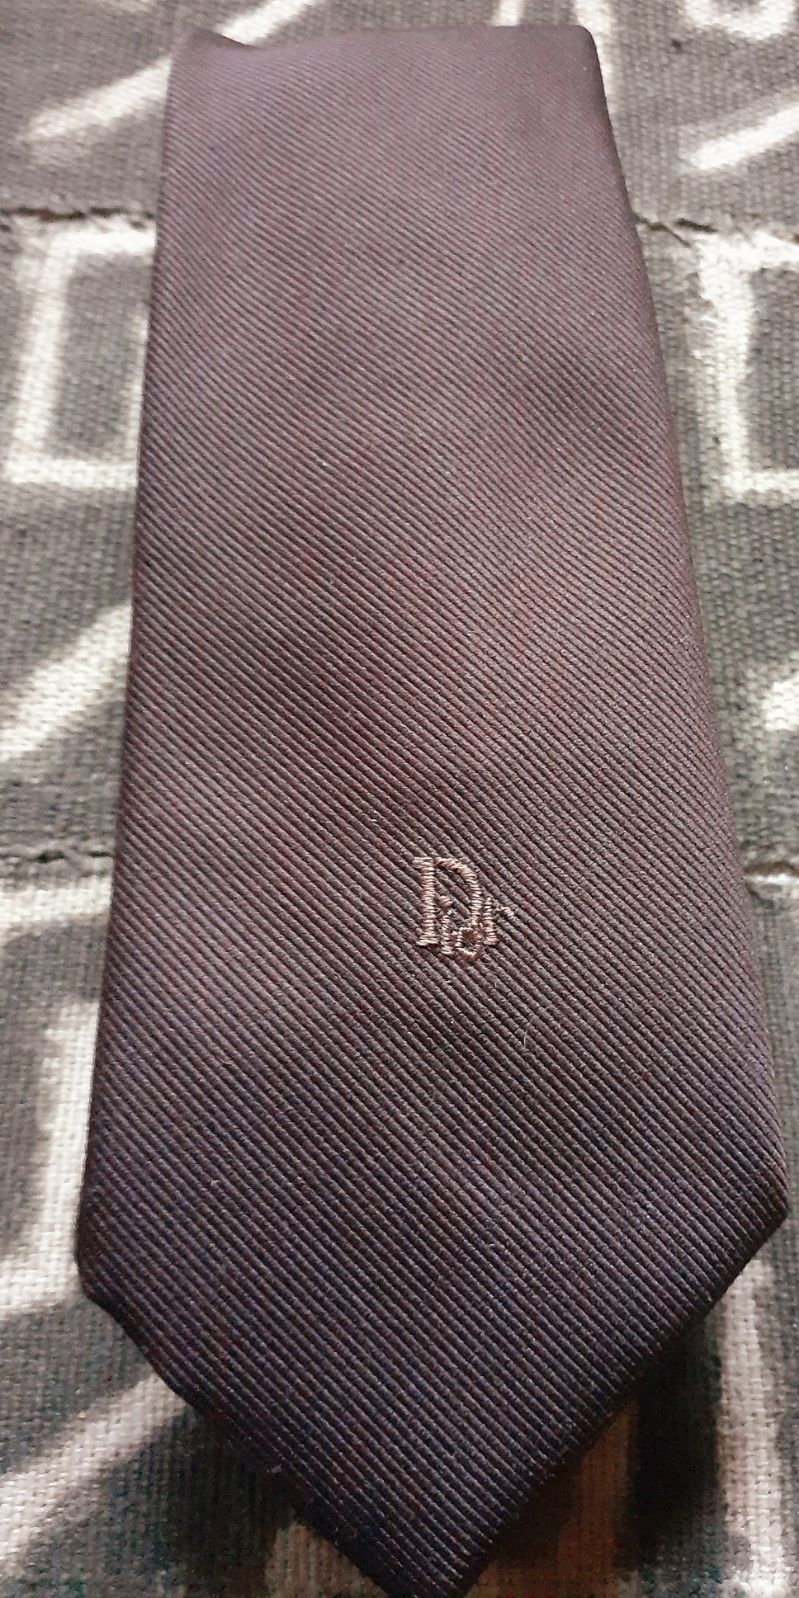 Vintage Christian Dior  Men's Neck Tie